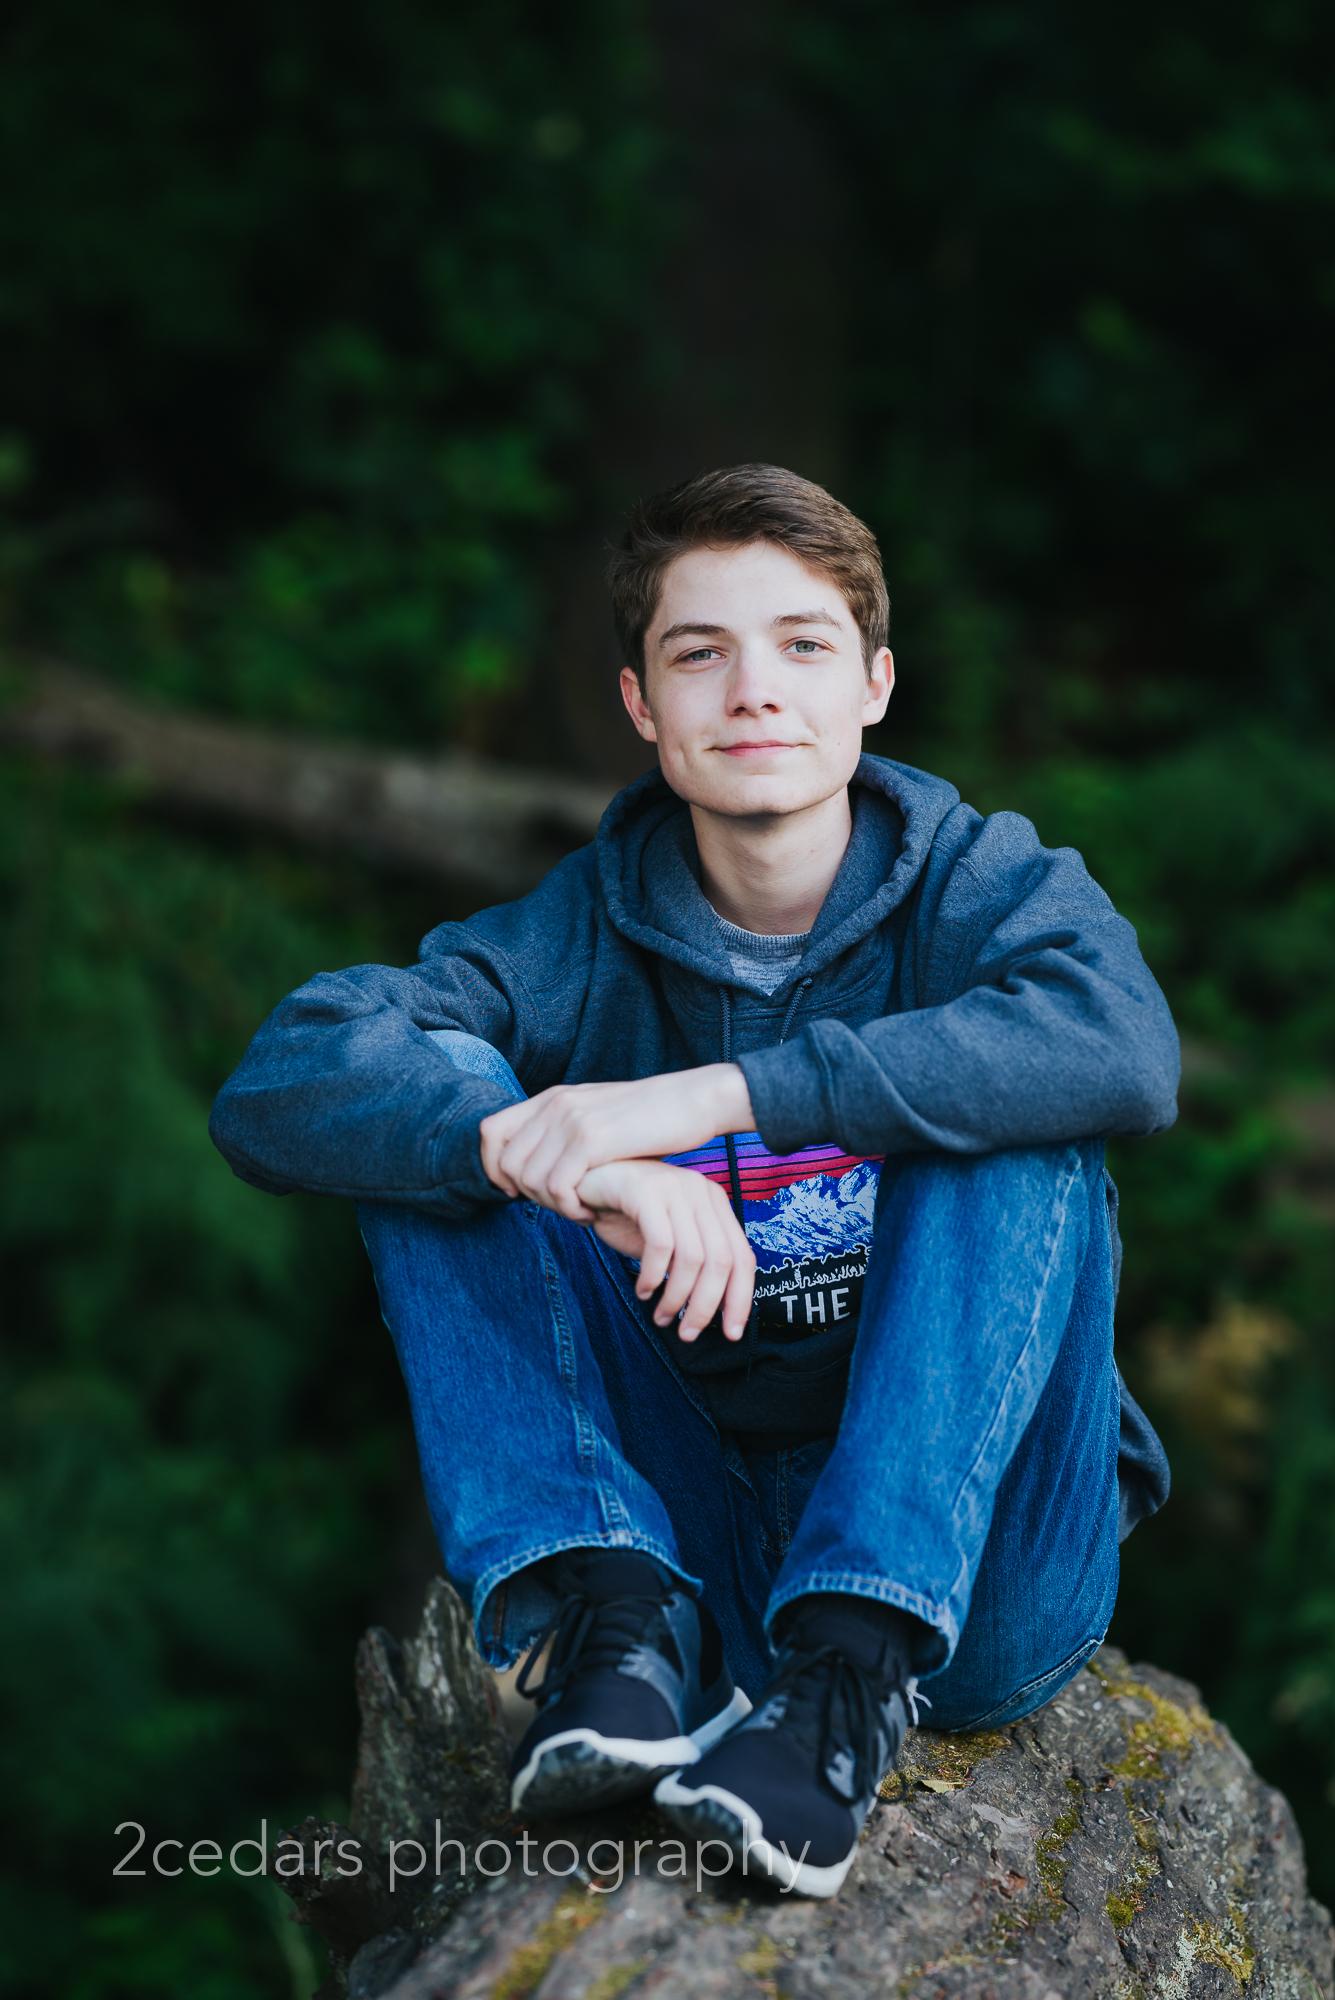 Web-Nate-Senior-Portraits-2cedarsphoto-7.jpg